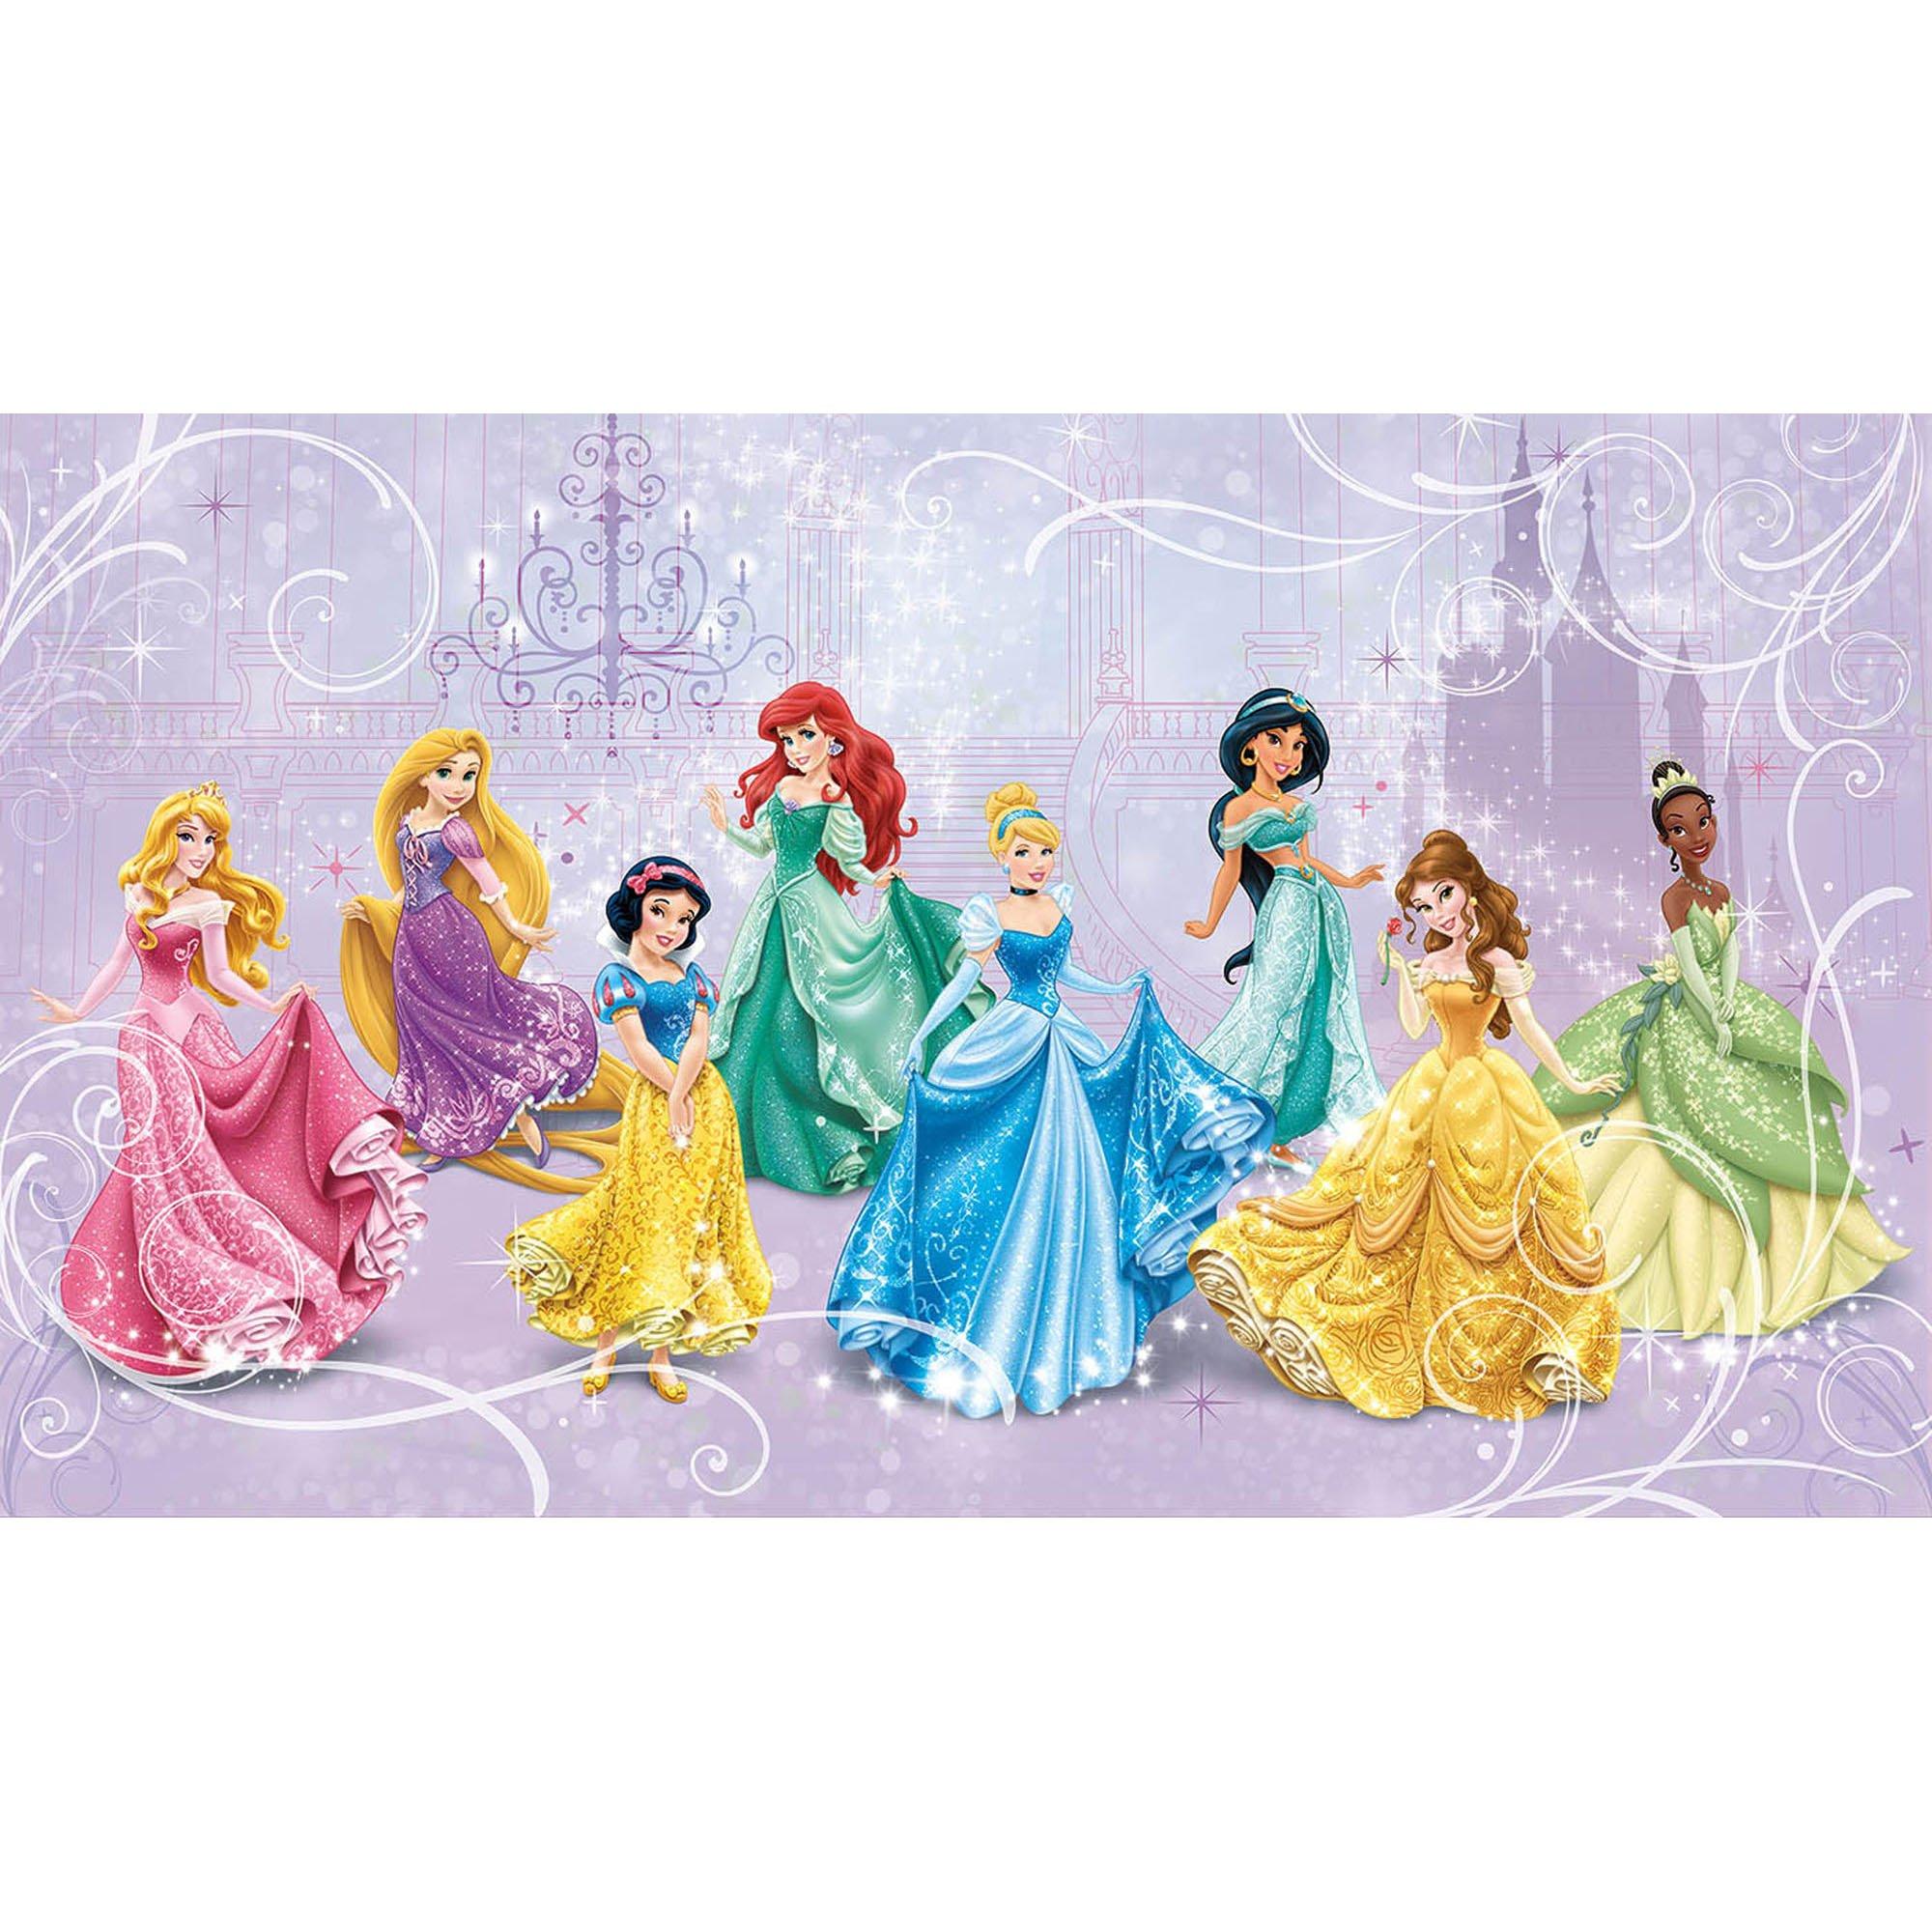 RoomMates Disney Princess Royal Debut Prepasted, Removable Wall Mural - 6' X 10.5' by RoomMates (Image #1)